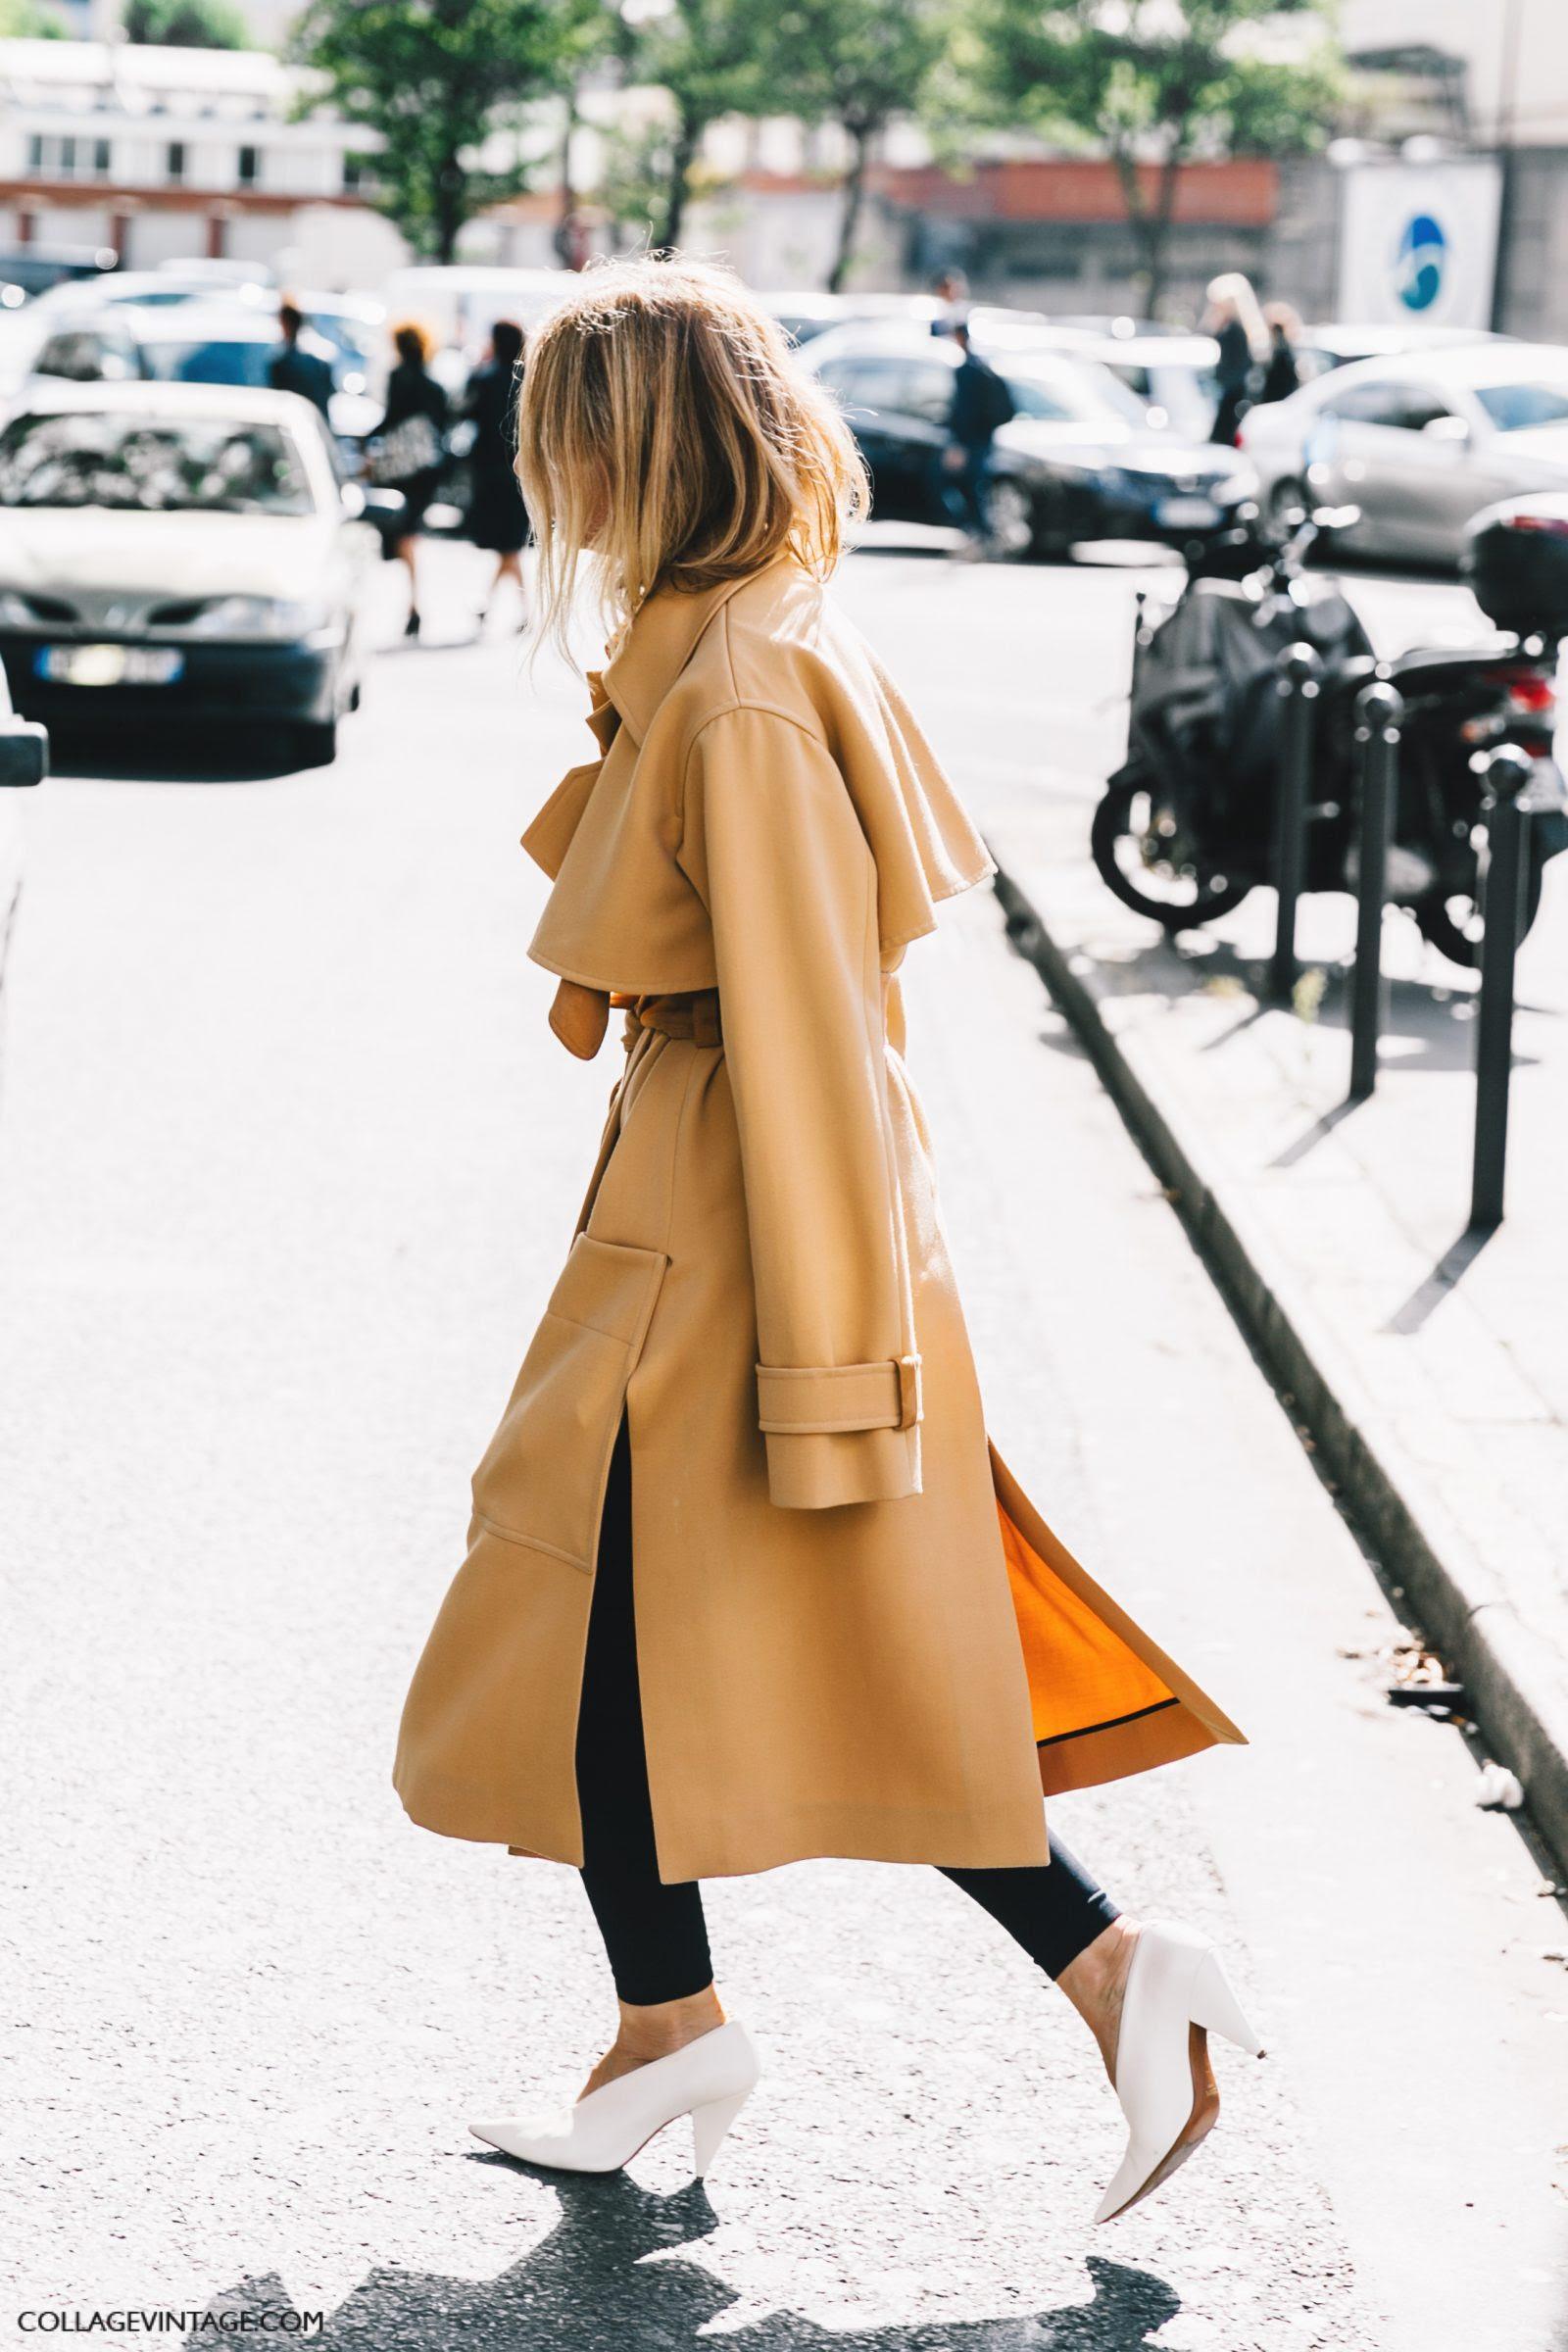 pfw-paris_fashion_week_ss17-street_style-outfits-collage_vintage-valentino-balenciaga-celine-87